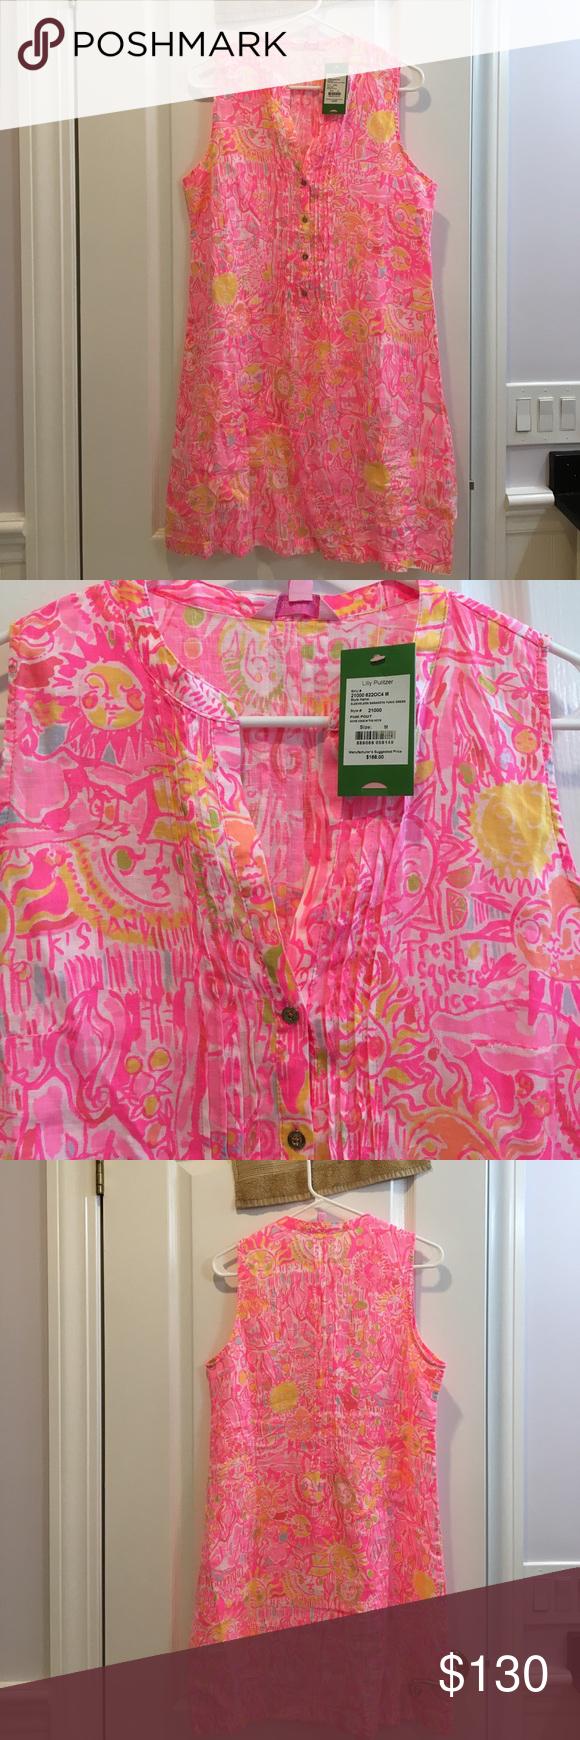 NWT Lilly Pulitzer Dress. Sleeveless Sarasota Tunic dress in pink ...